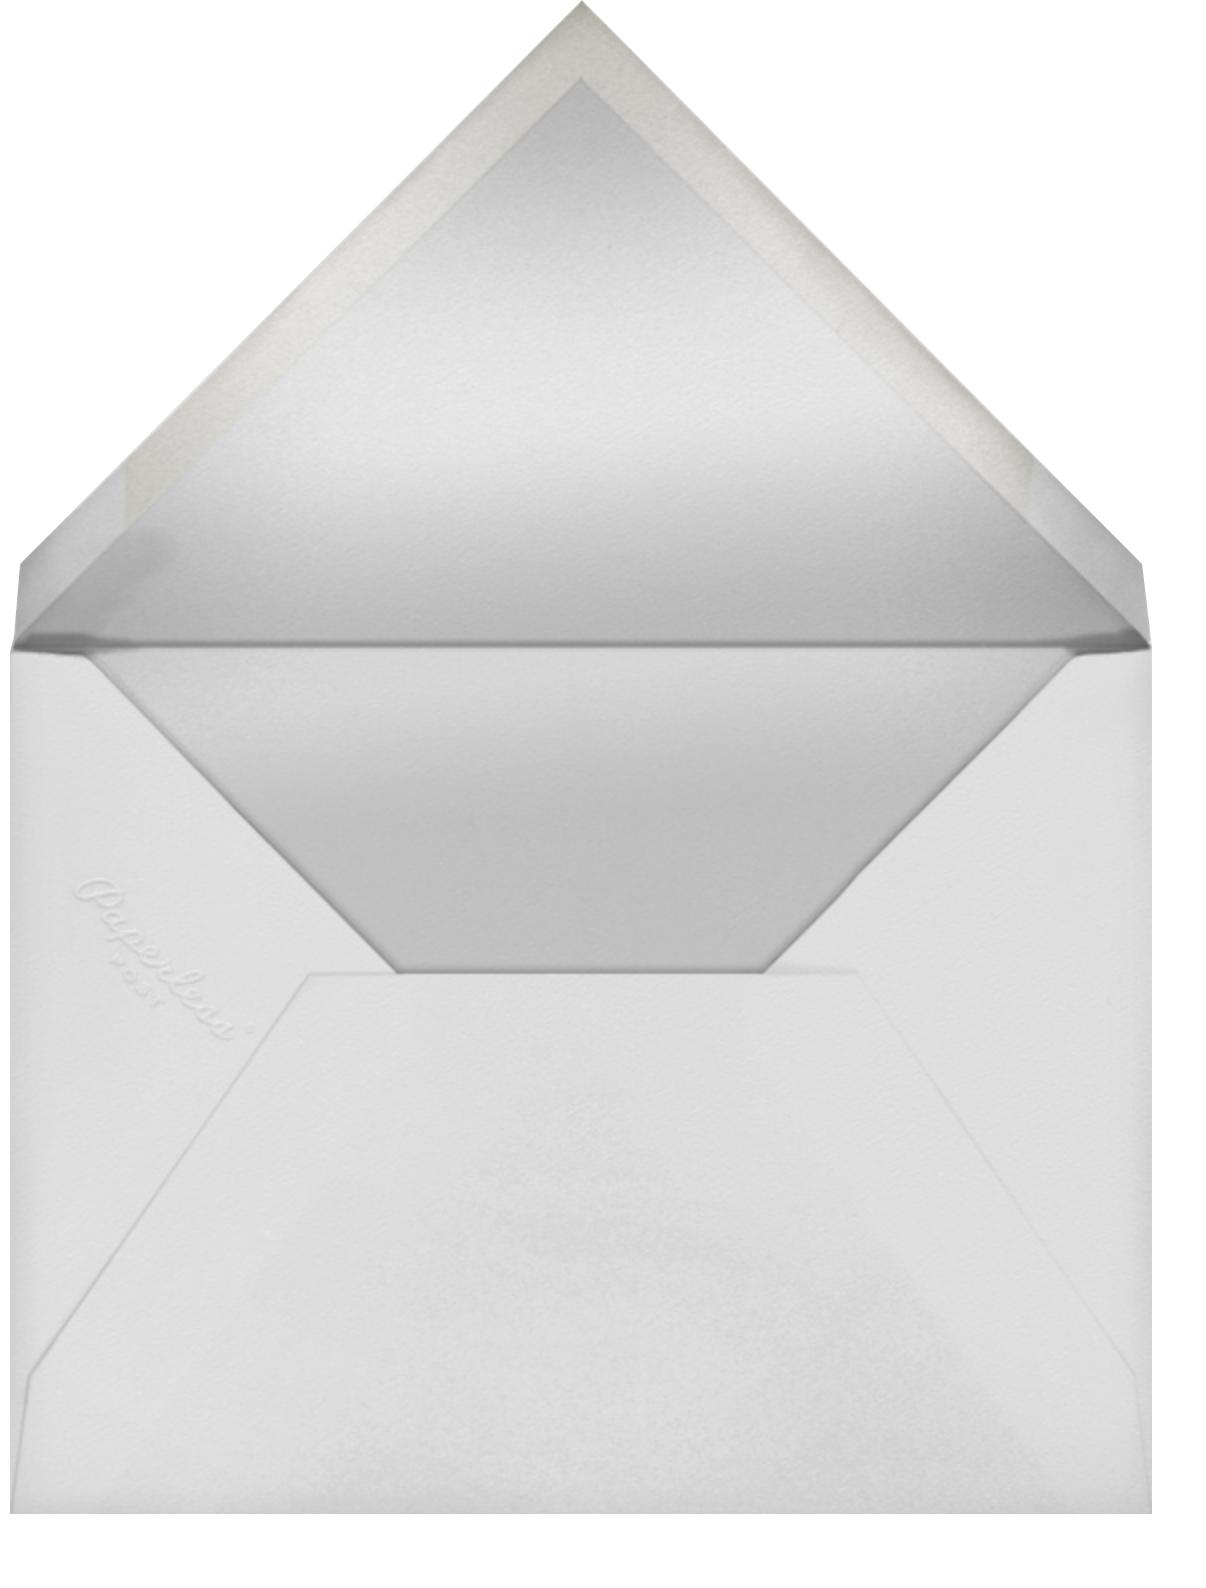 January Herbarium (Program) - Rifle Paper Co. - Menus and programs - envelope back